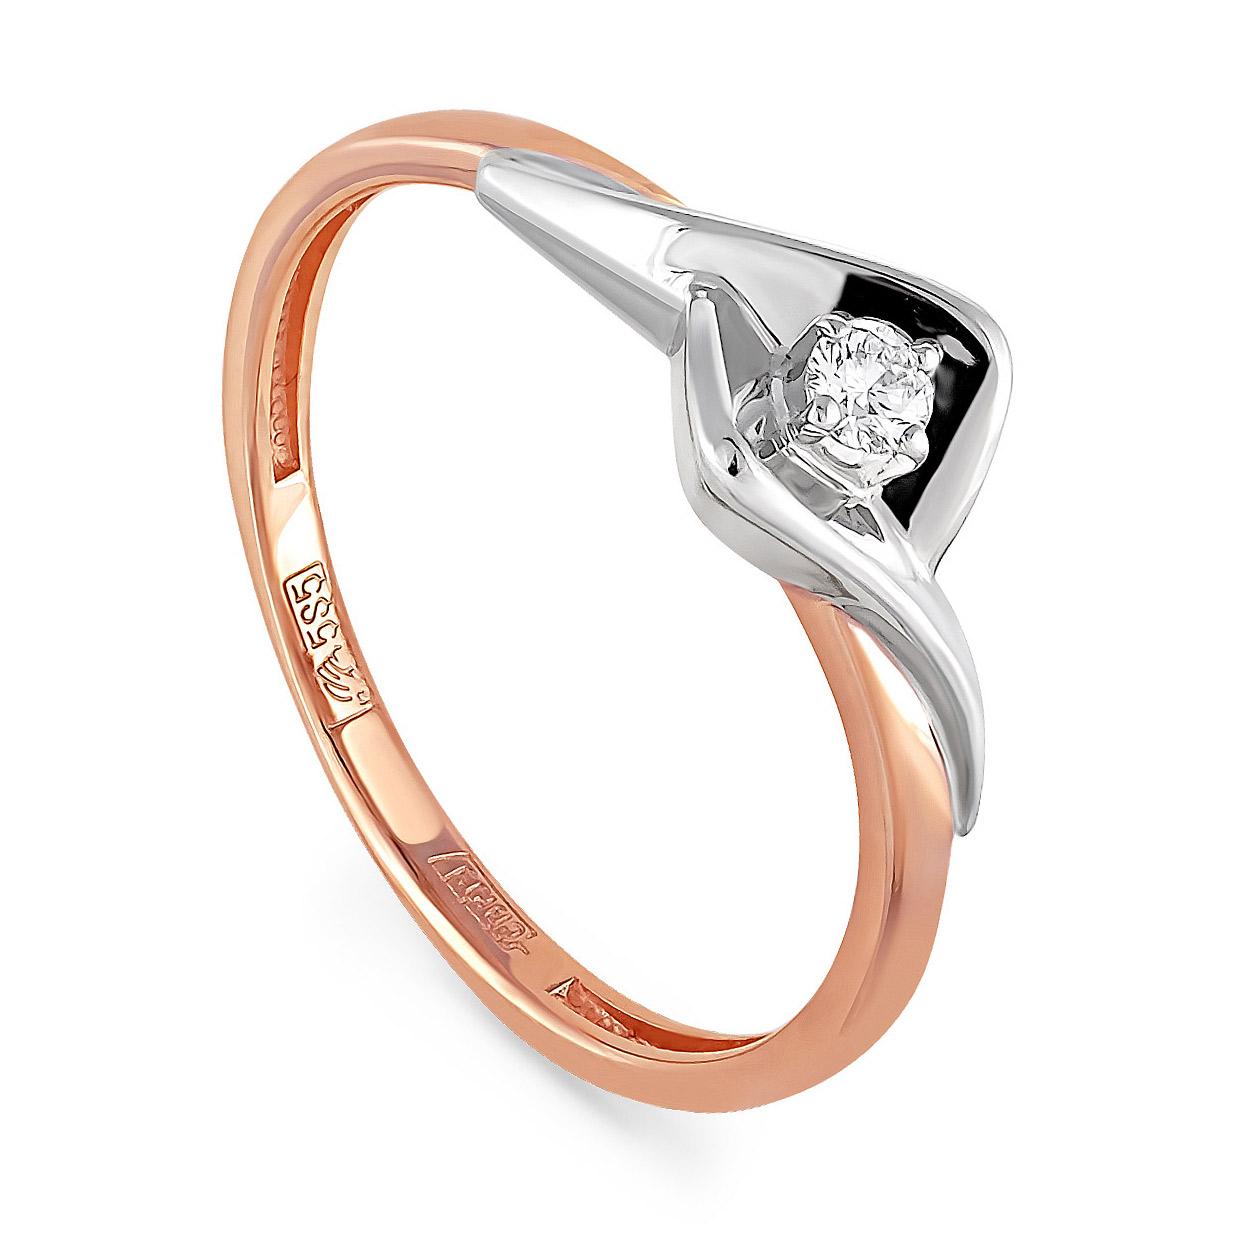 Золотое кольцо Бриллиант арт. 11-0825-1000 11-0825-1000